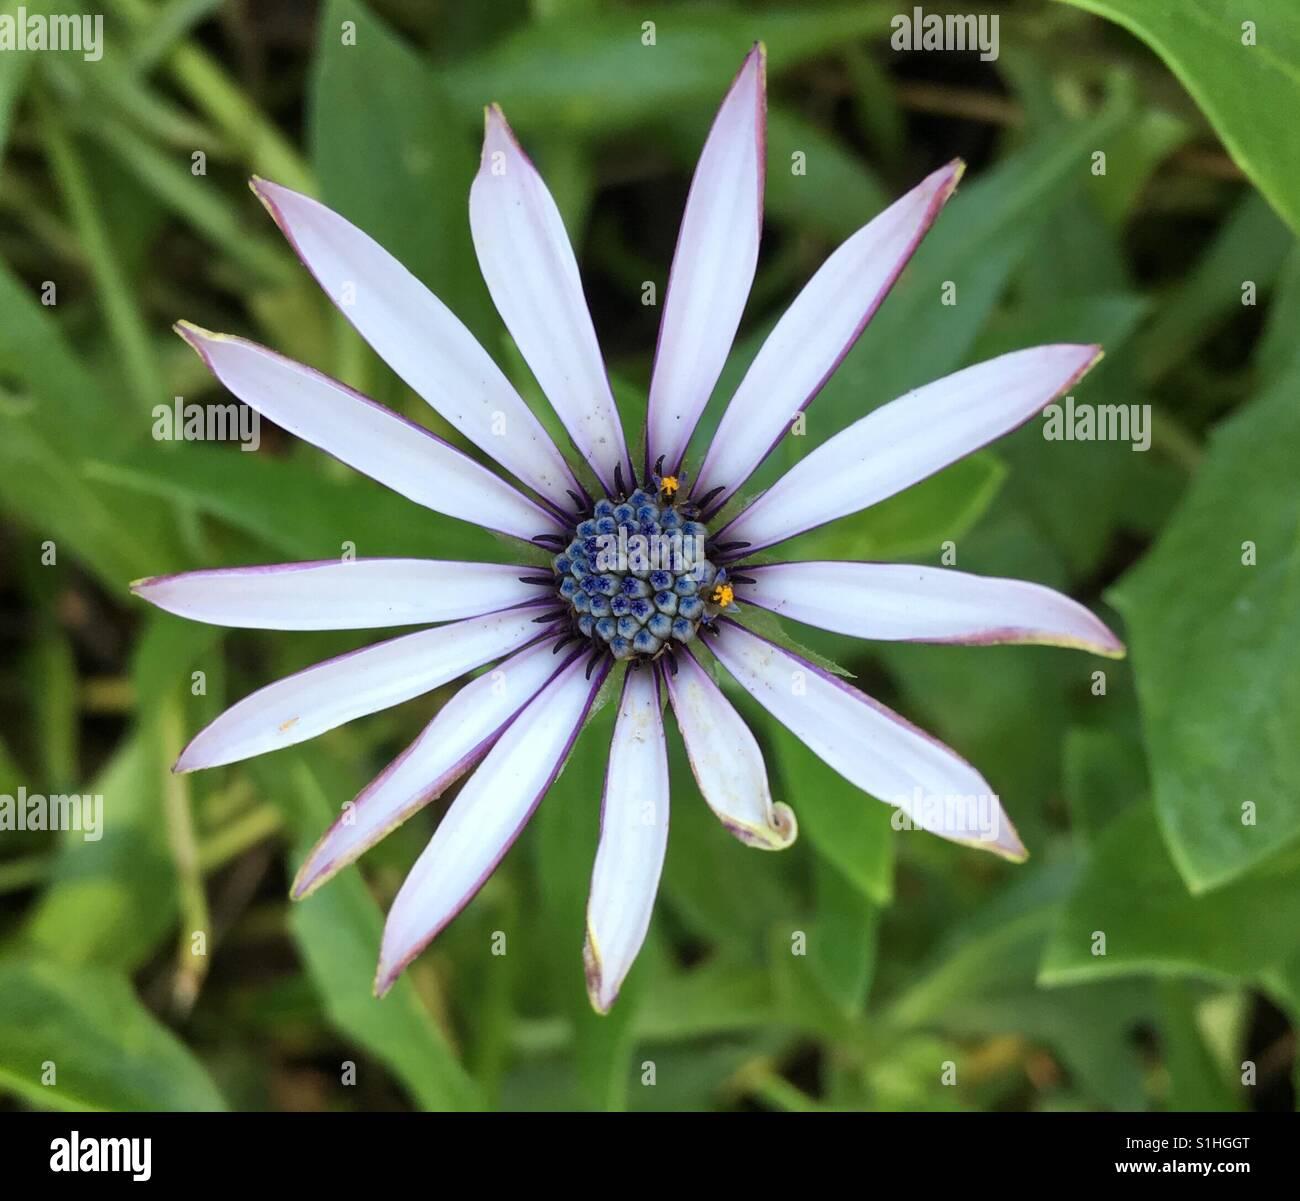 Purple flower with blue center stock photos purple flower with white wild daisy with blue center stock image izmirmasajfo